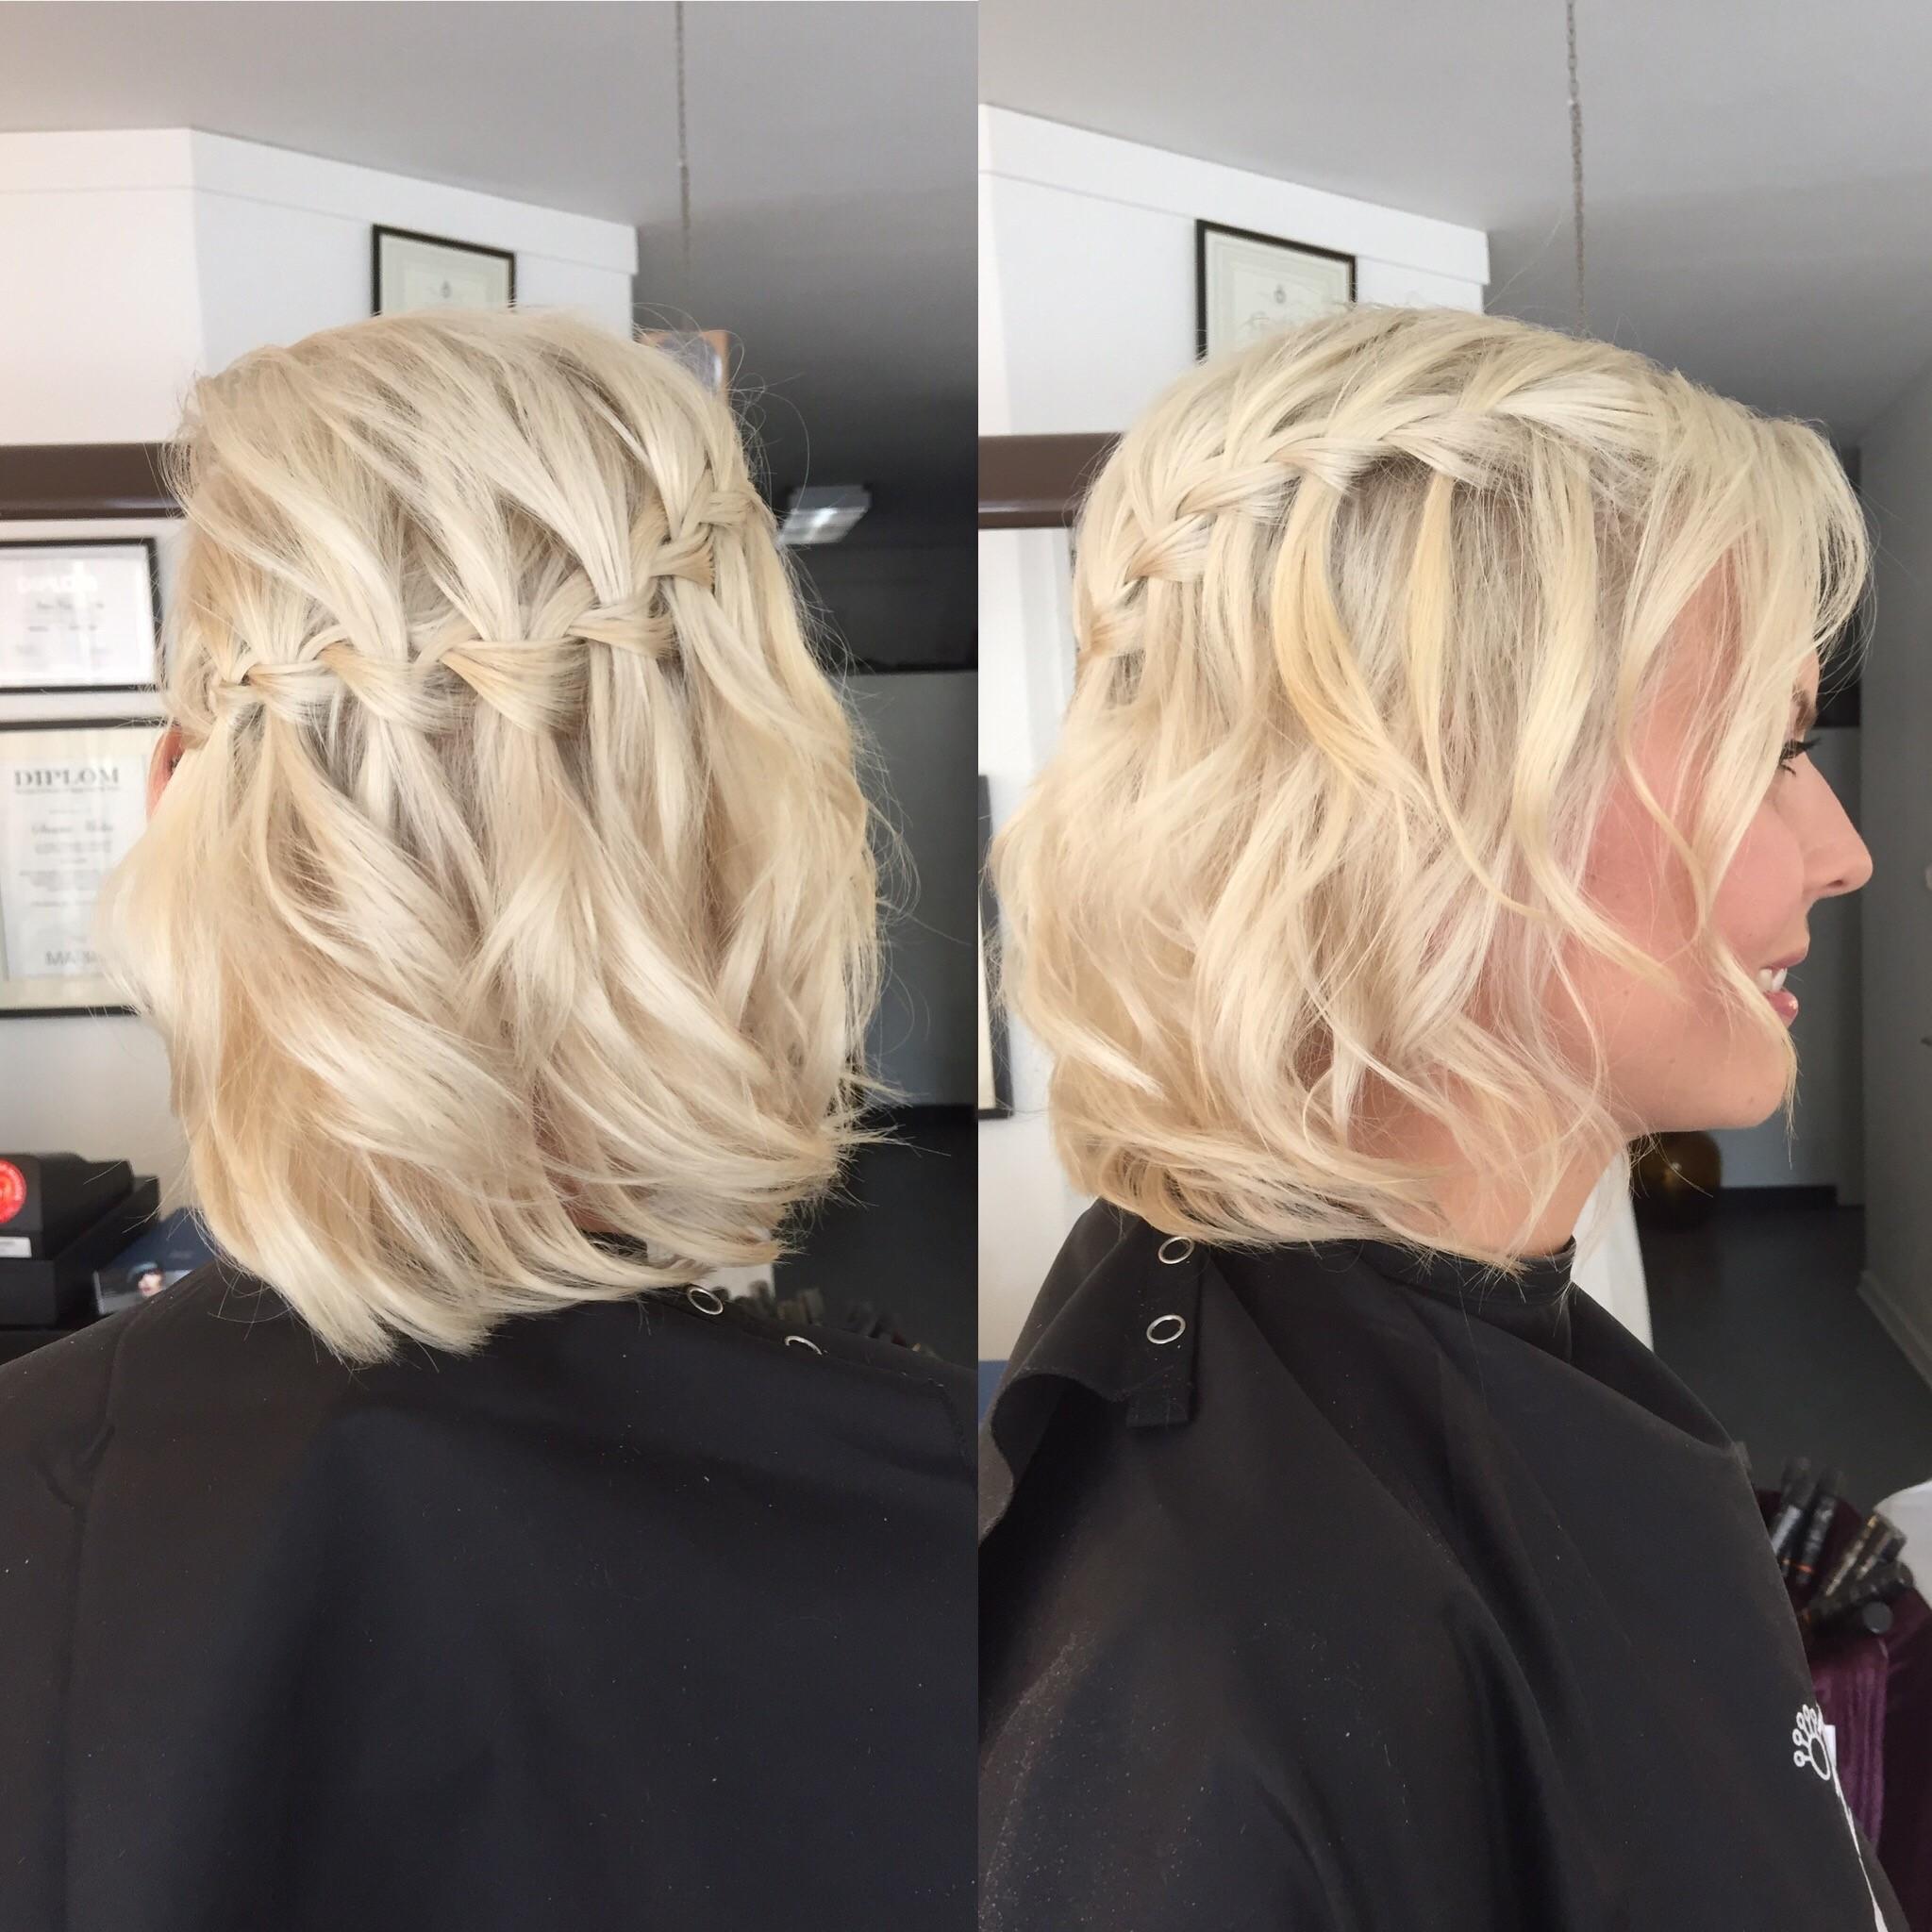 Aniara - Din frisör Osby